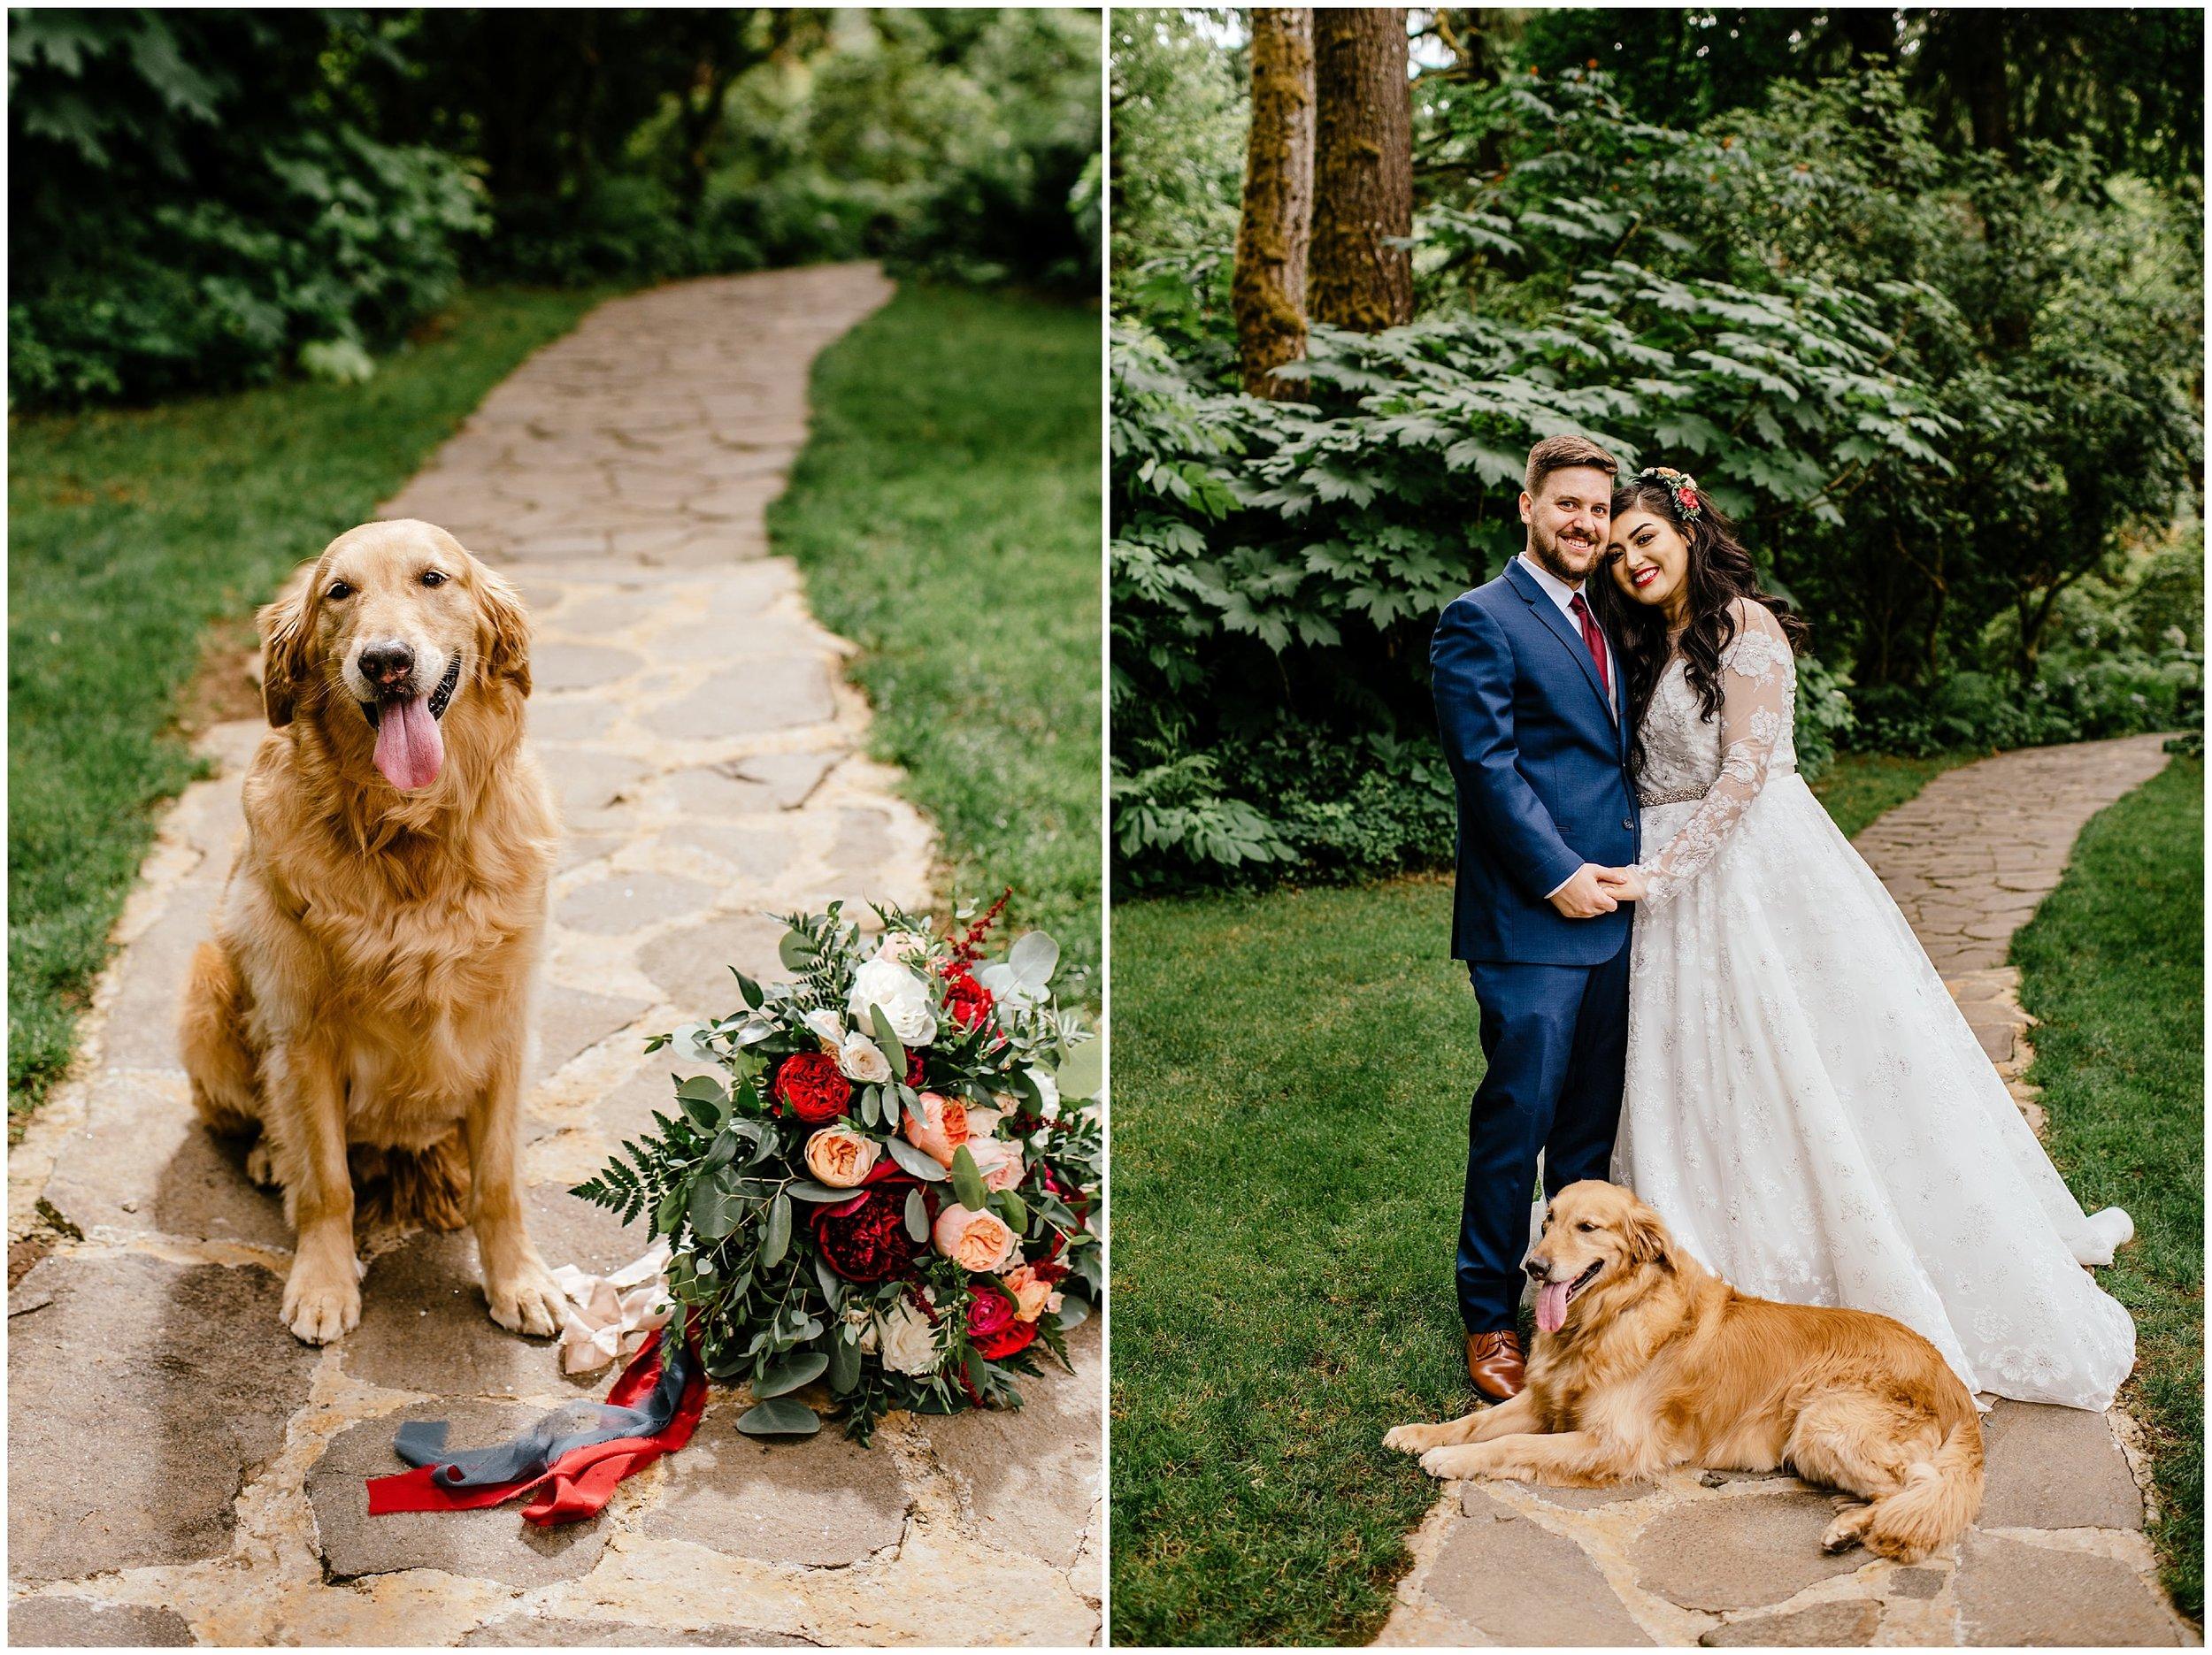 Spanish-inspired-wedding-bridal-veil-lakes-80.jpg